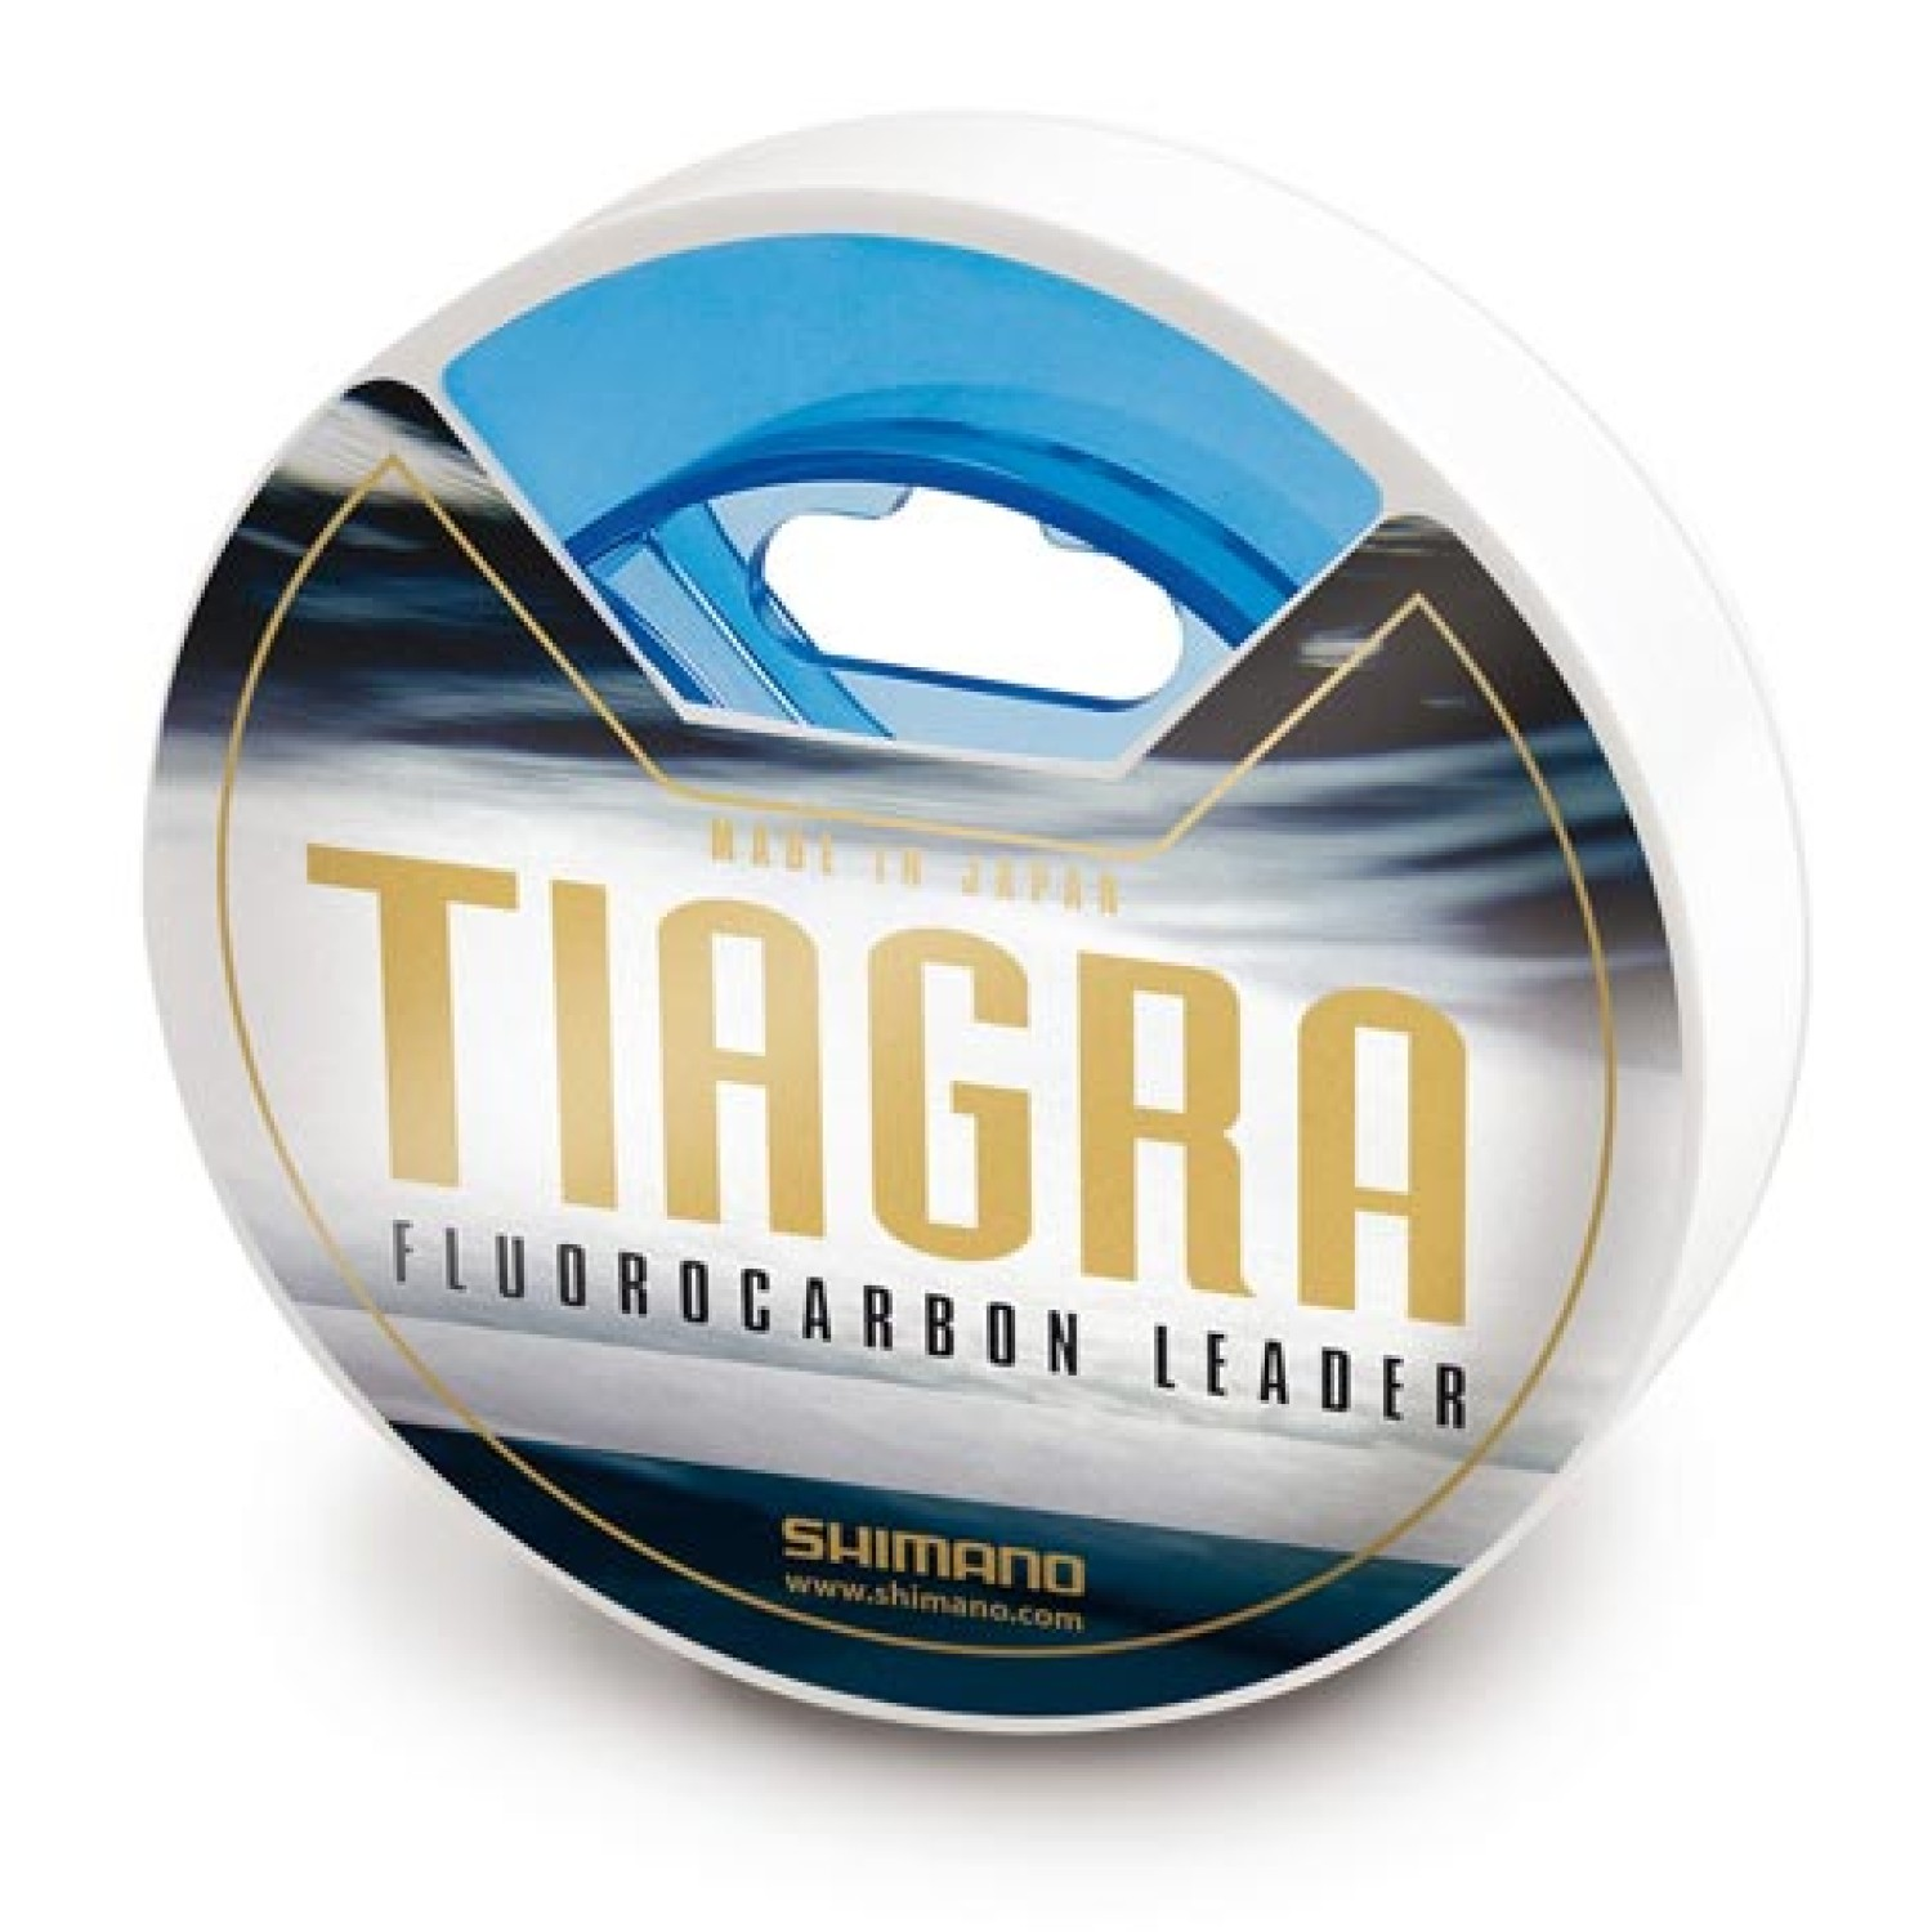 Tiagra Fluocarbon Leader